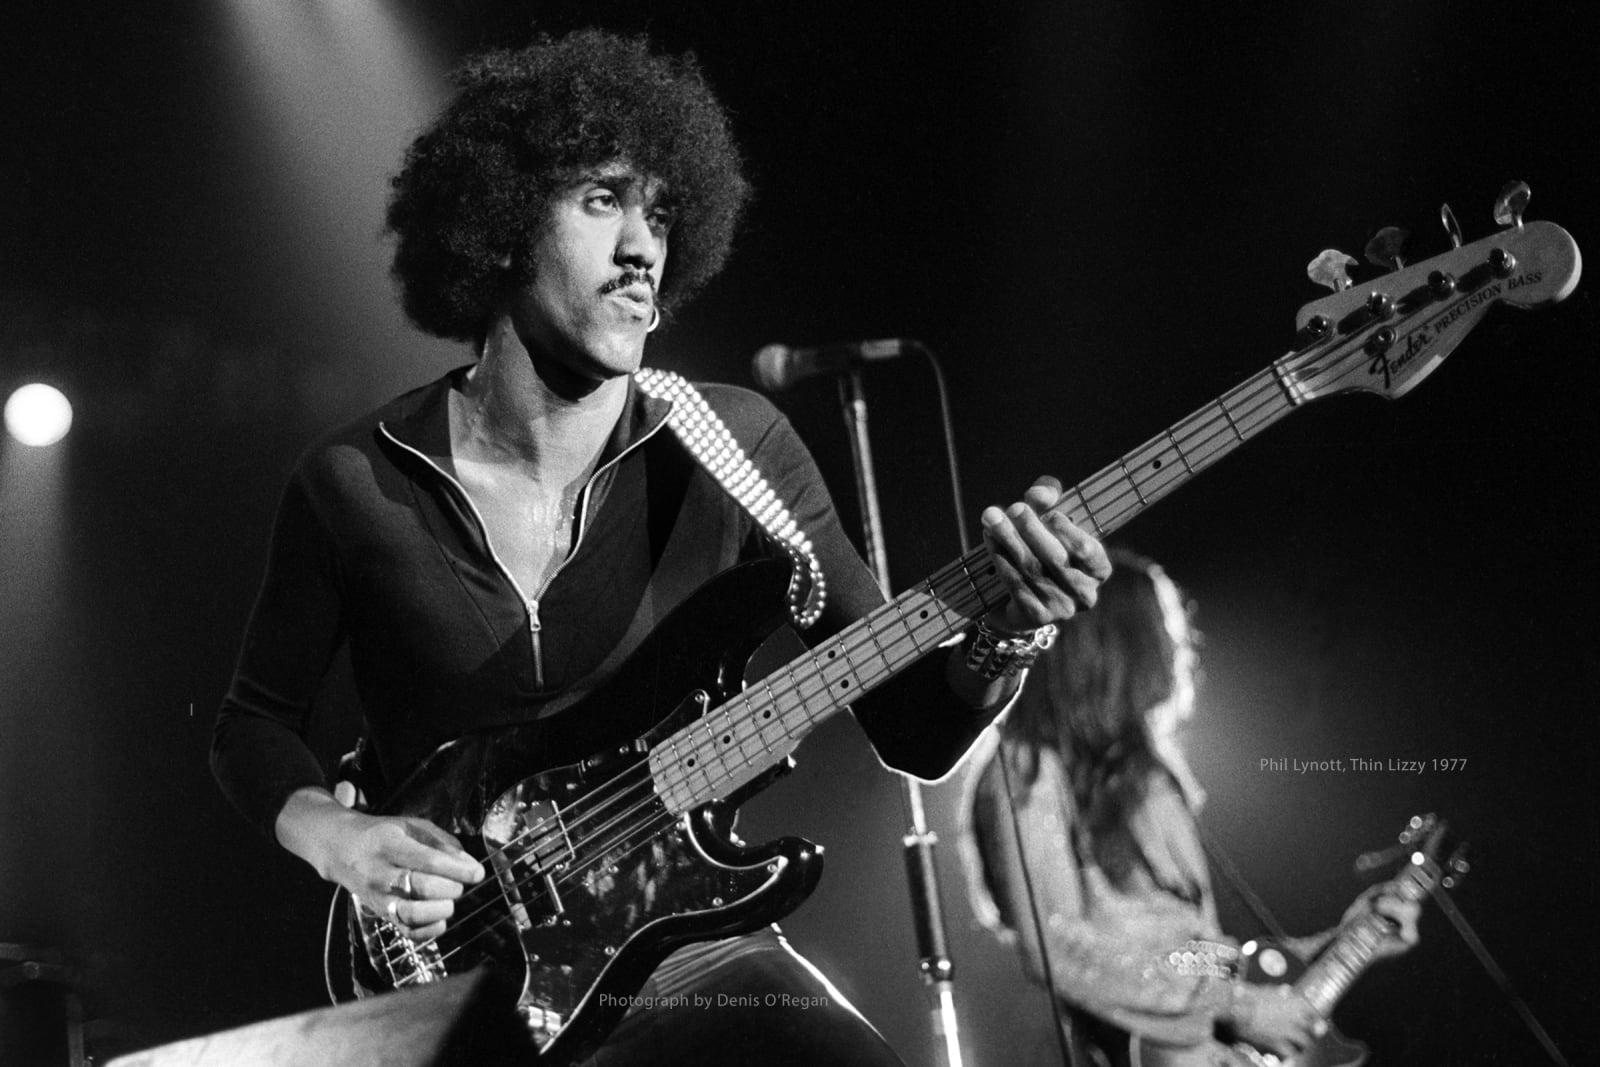 THIN LIZZY, Phil Lynott Live, 1977